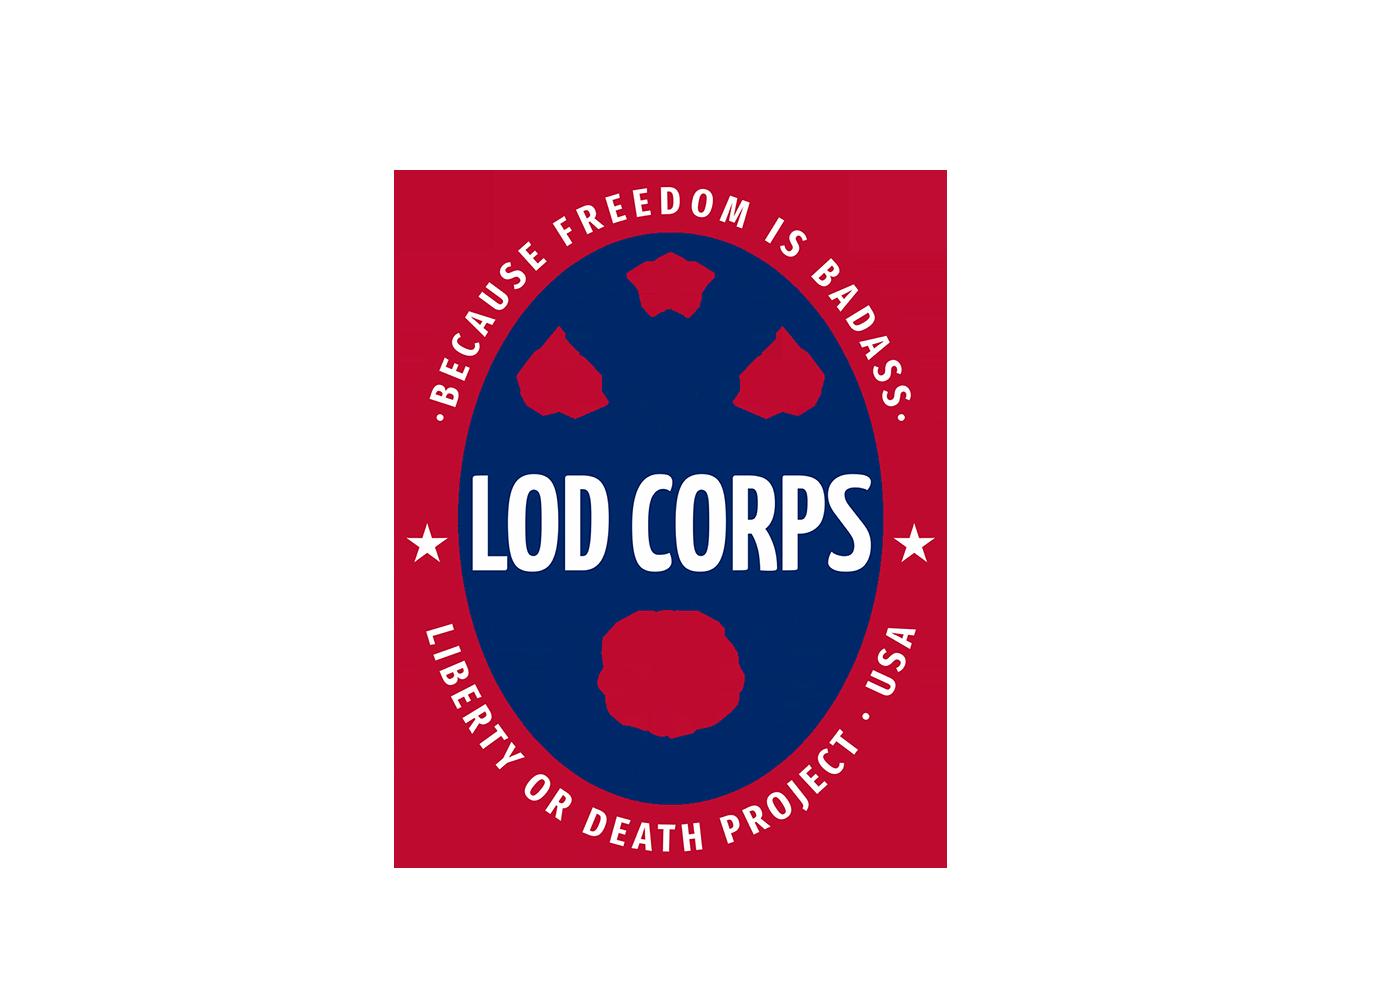 LOD CORPS shirt front logo